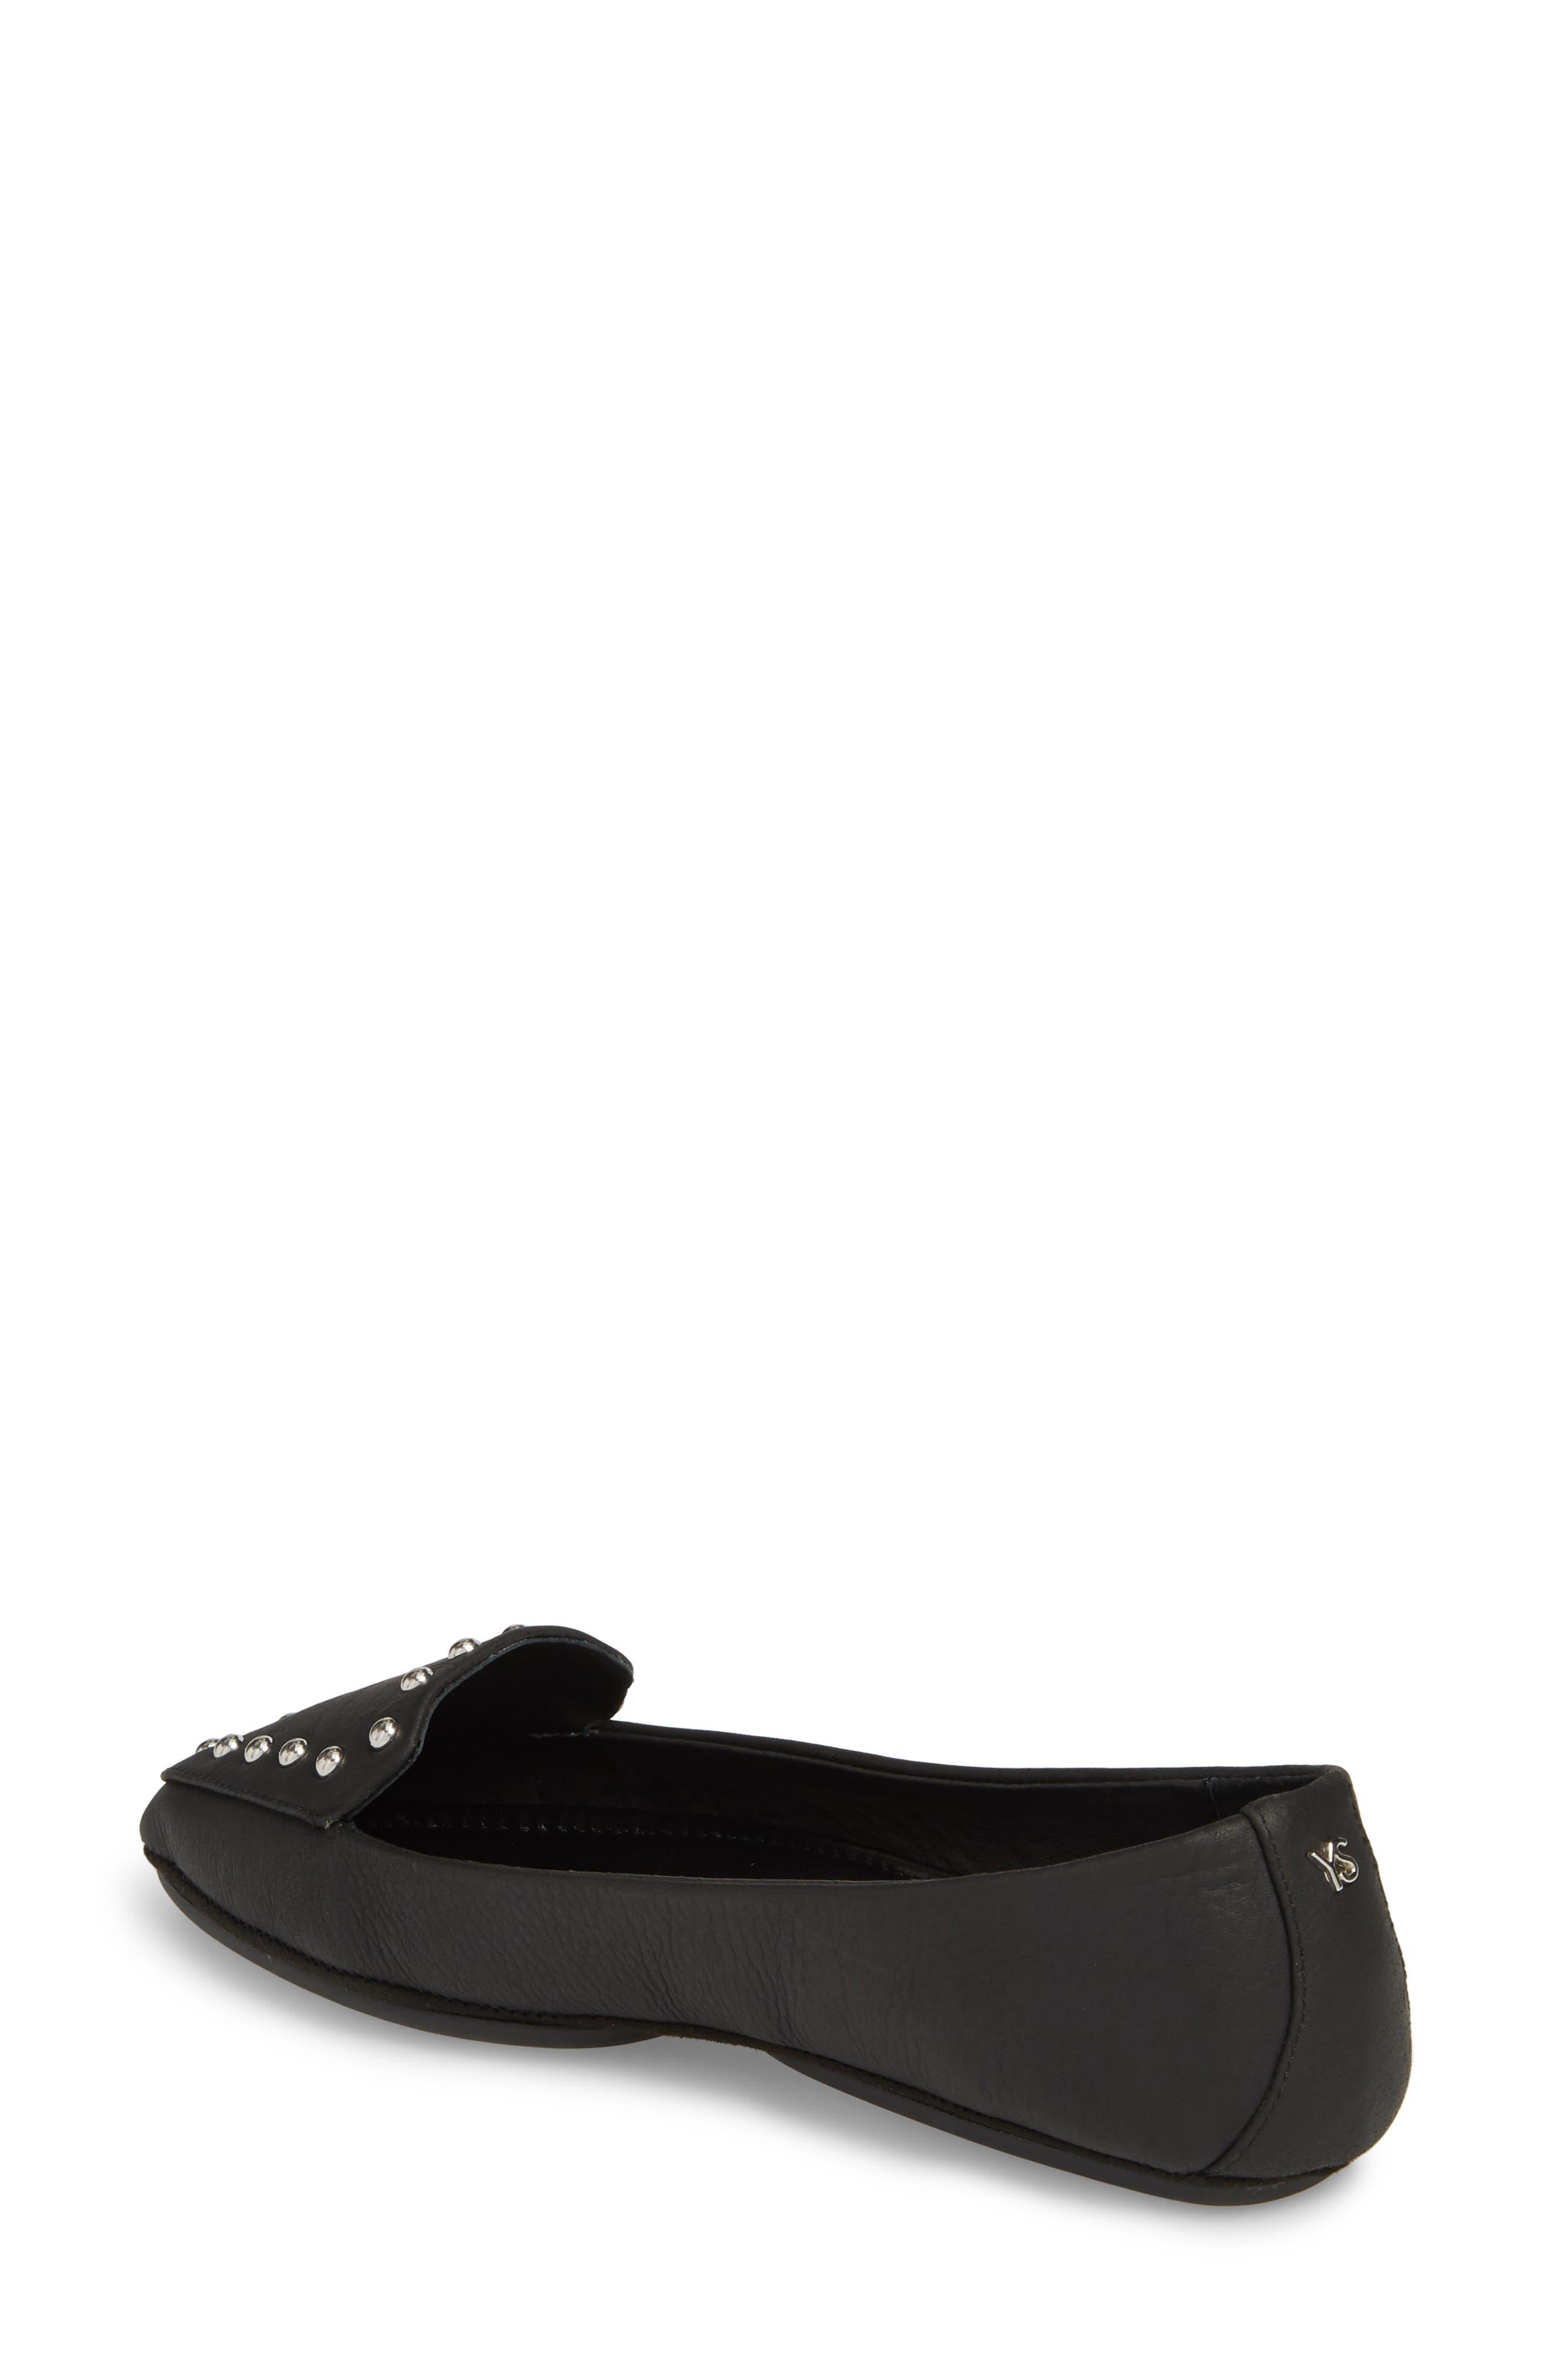 Vera Loafer,                             Alternate thumbnail 2, color,                             Black Stud Leather